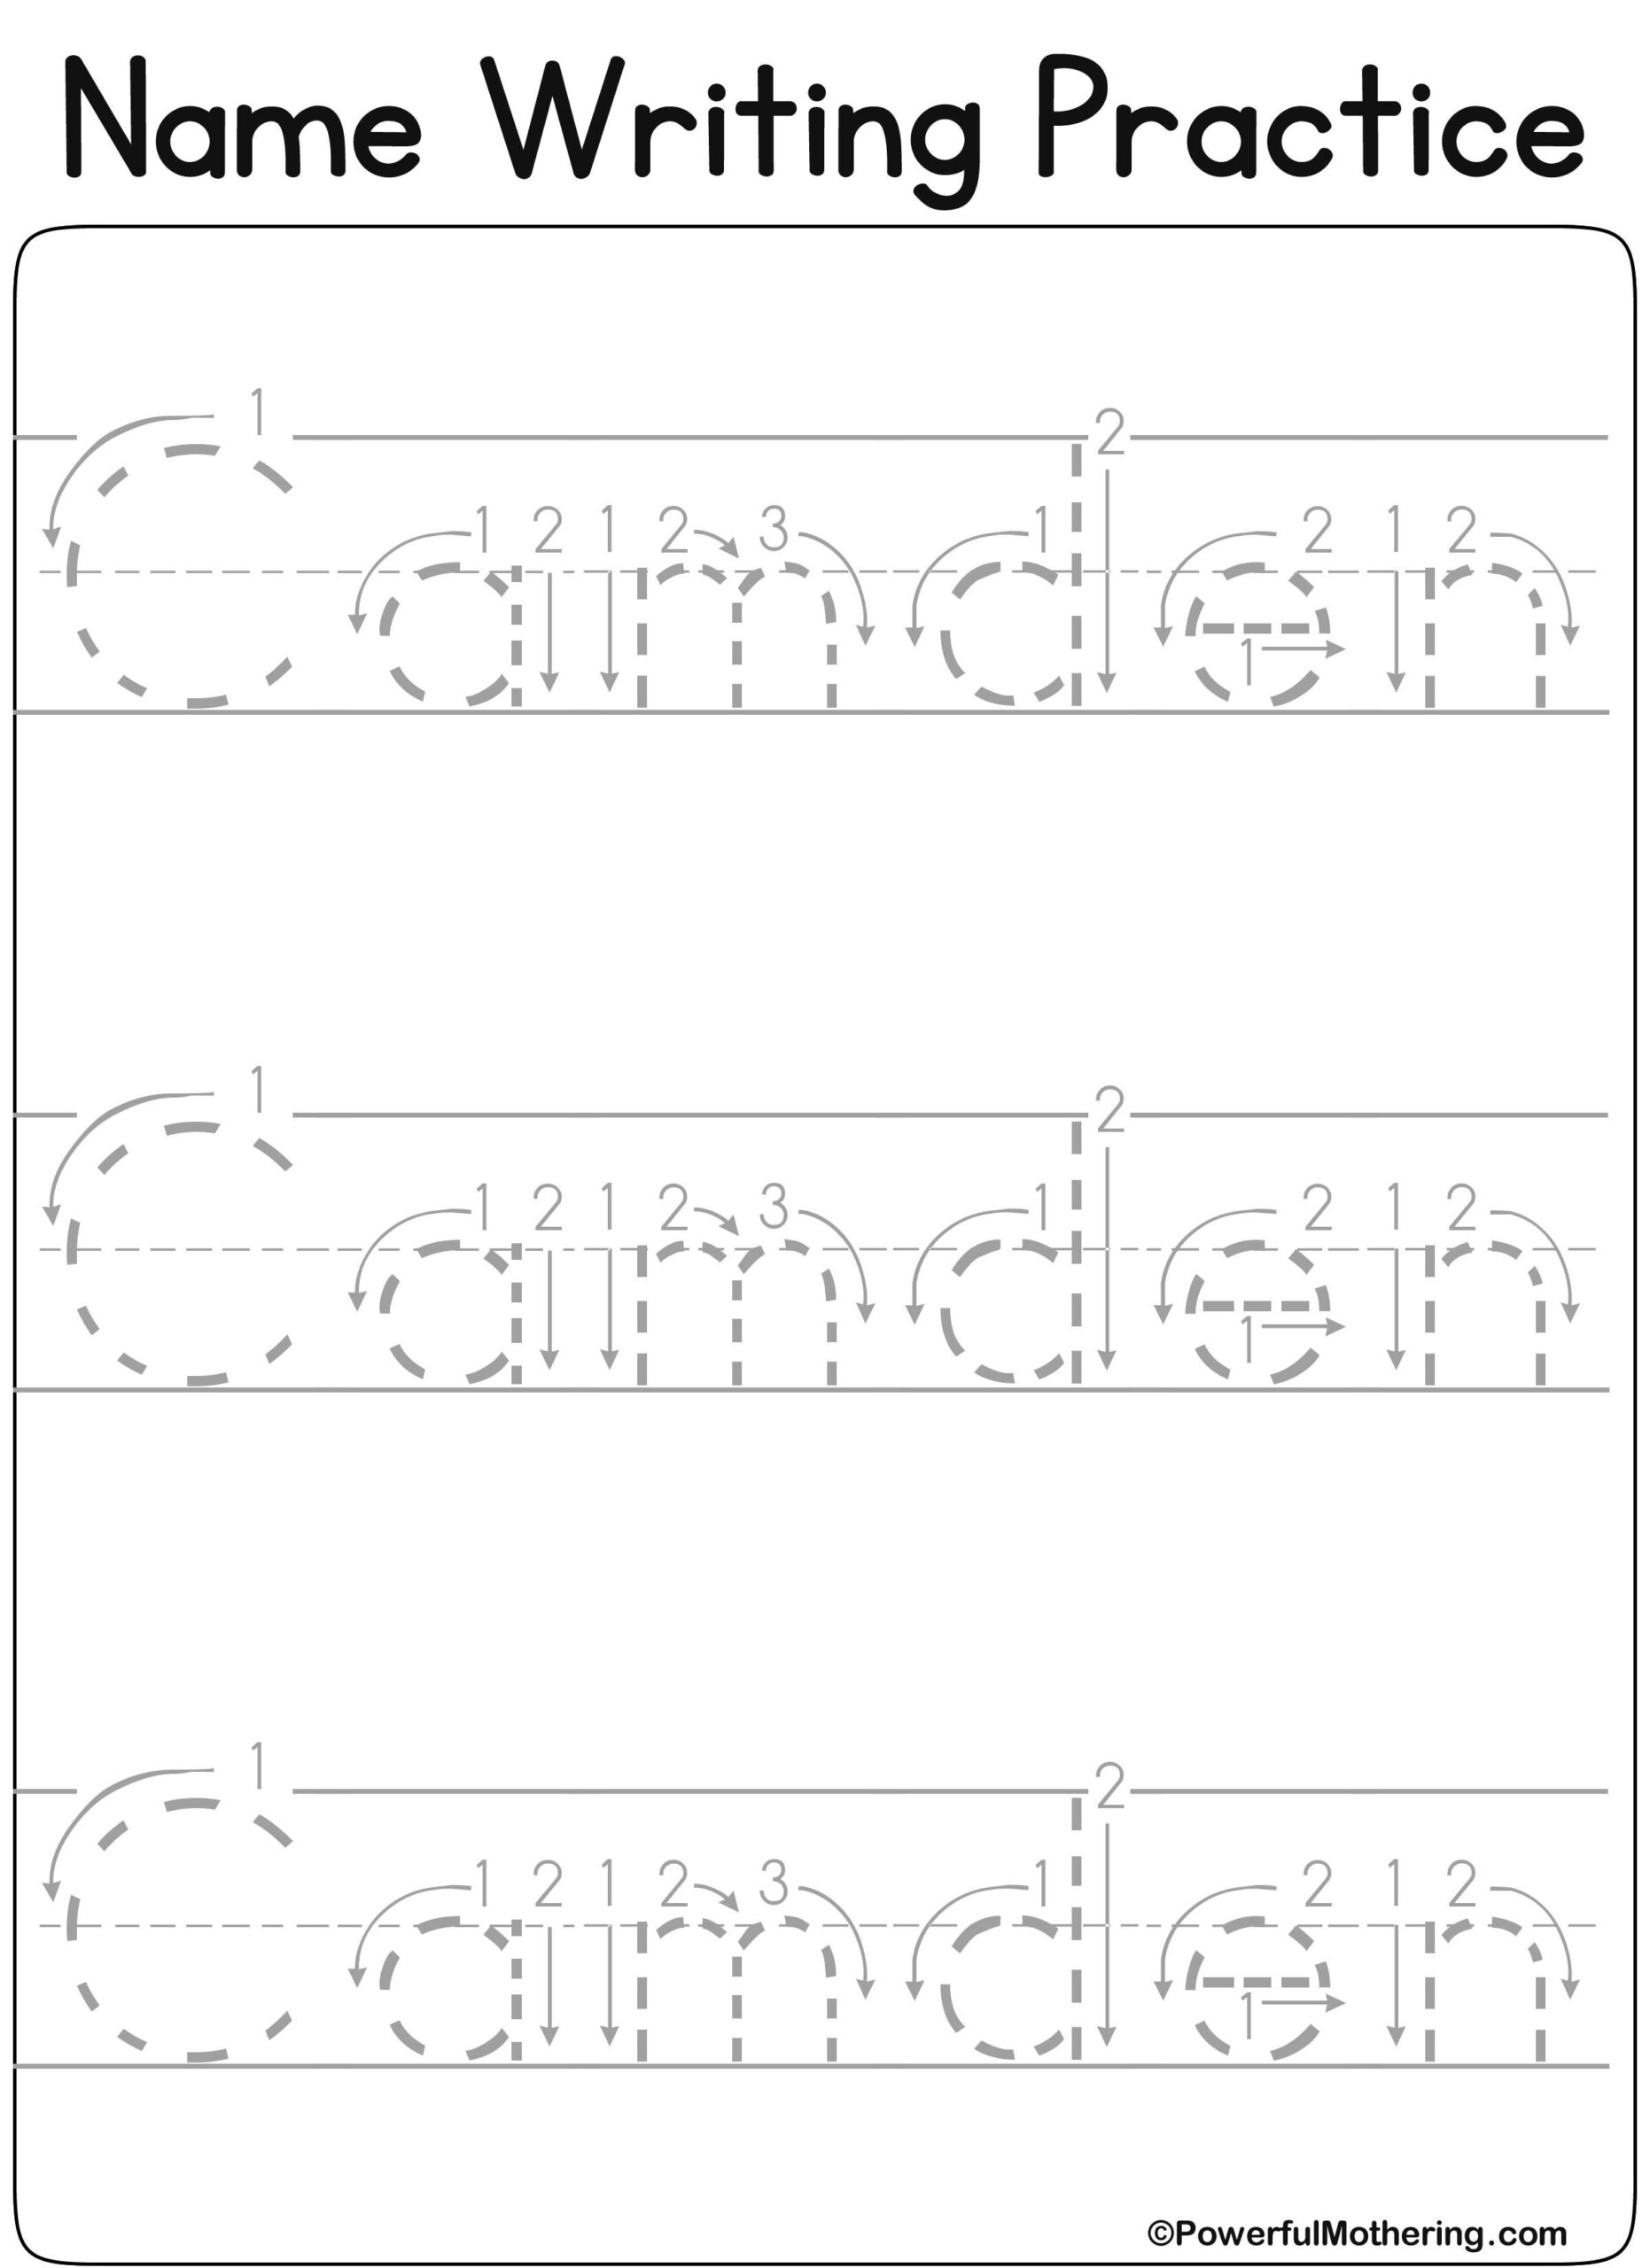 Www.createprintables Custom_Name_Get.php?text&#x3D regarding Name Tracing Kinder